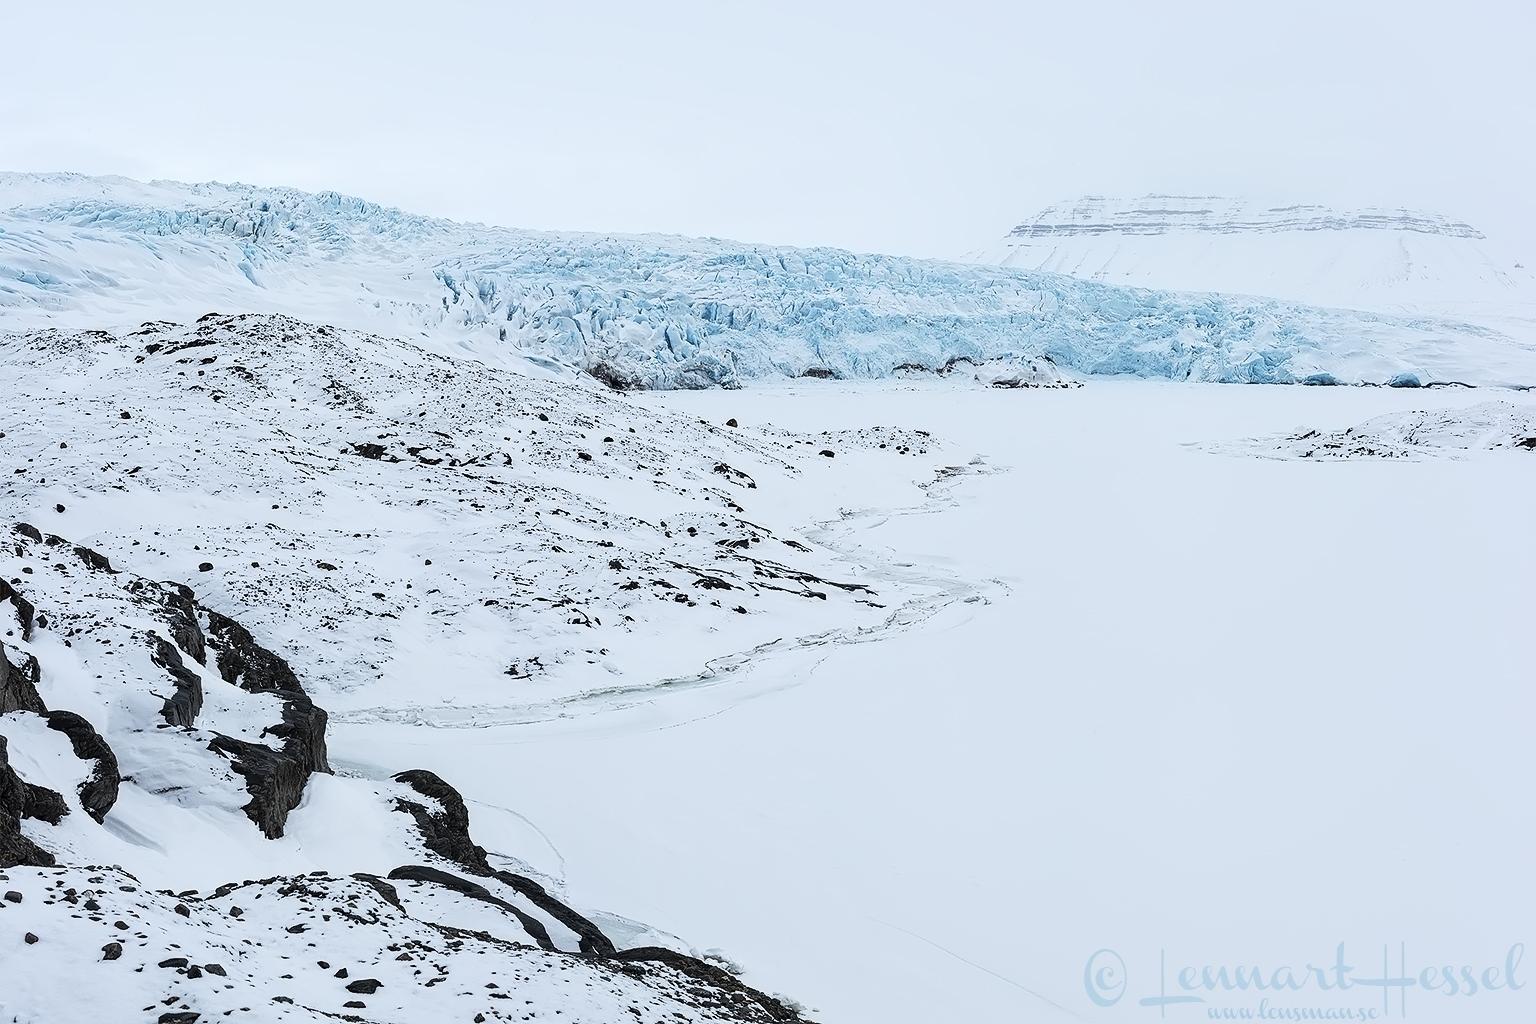 Nodenskiöld glacier Arctic Svalbard